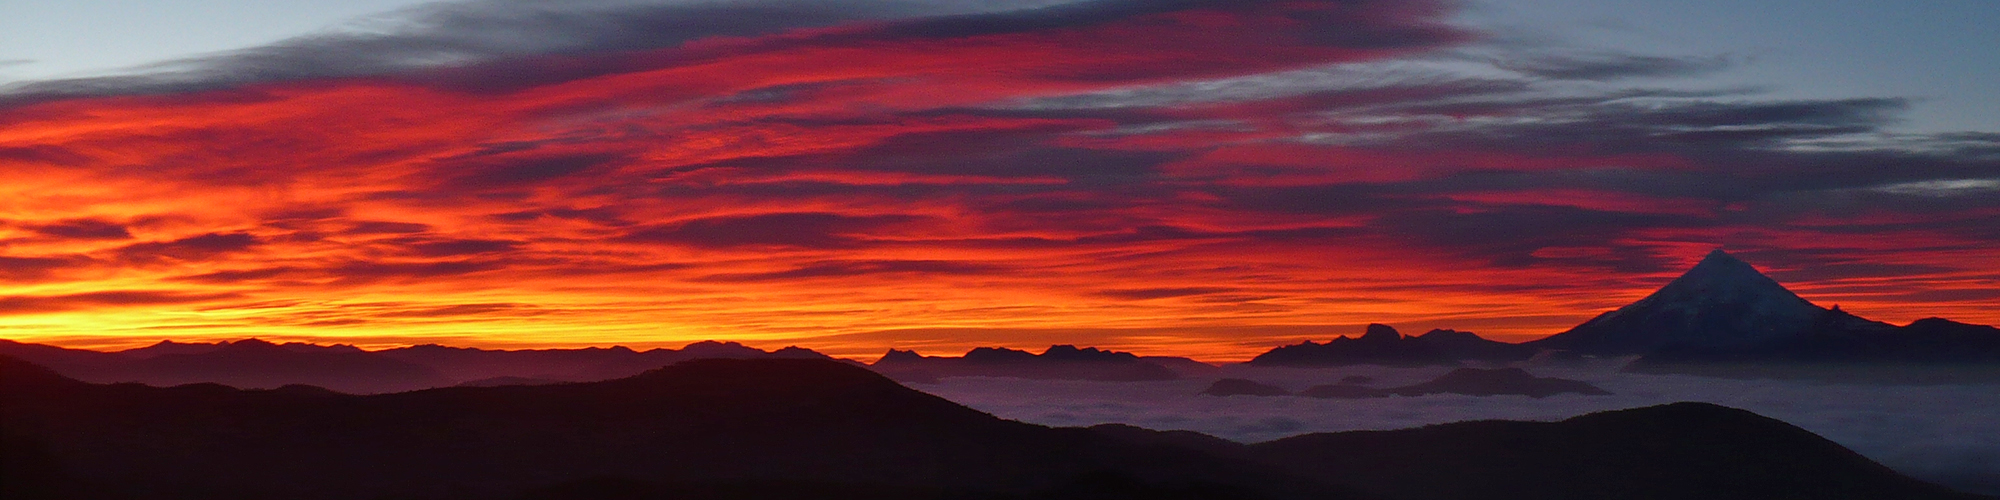 WS Chile slice mountain sunset P1020662.jpg